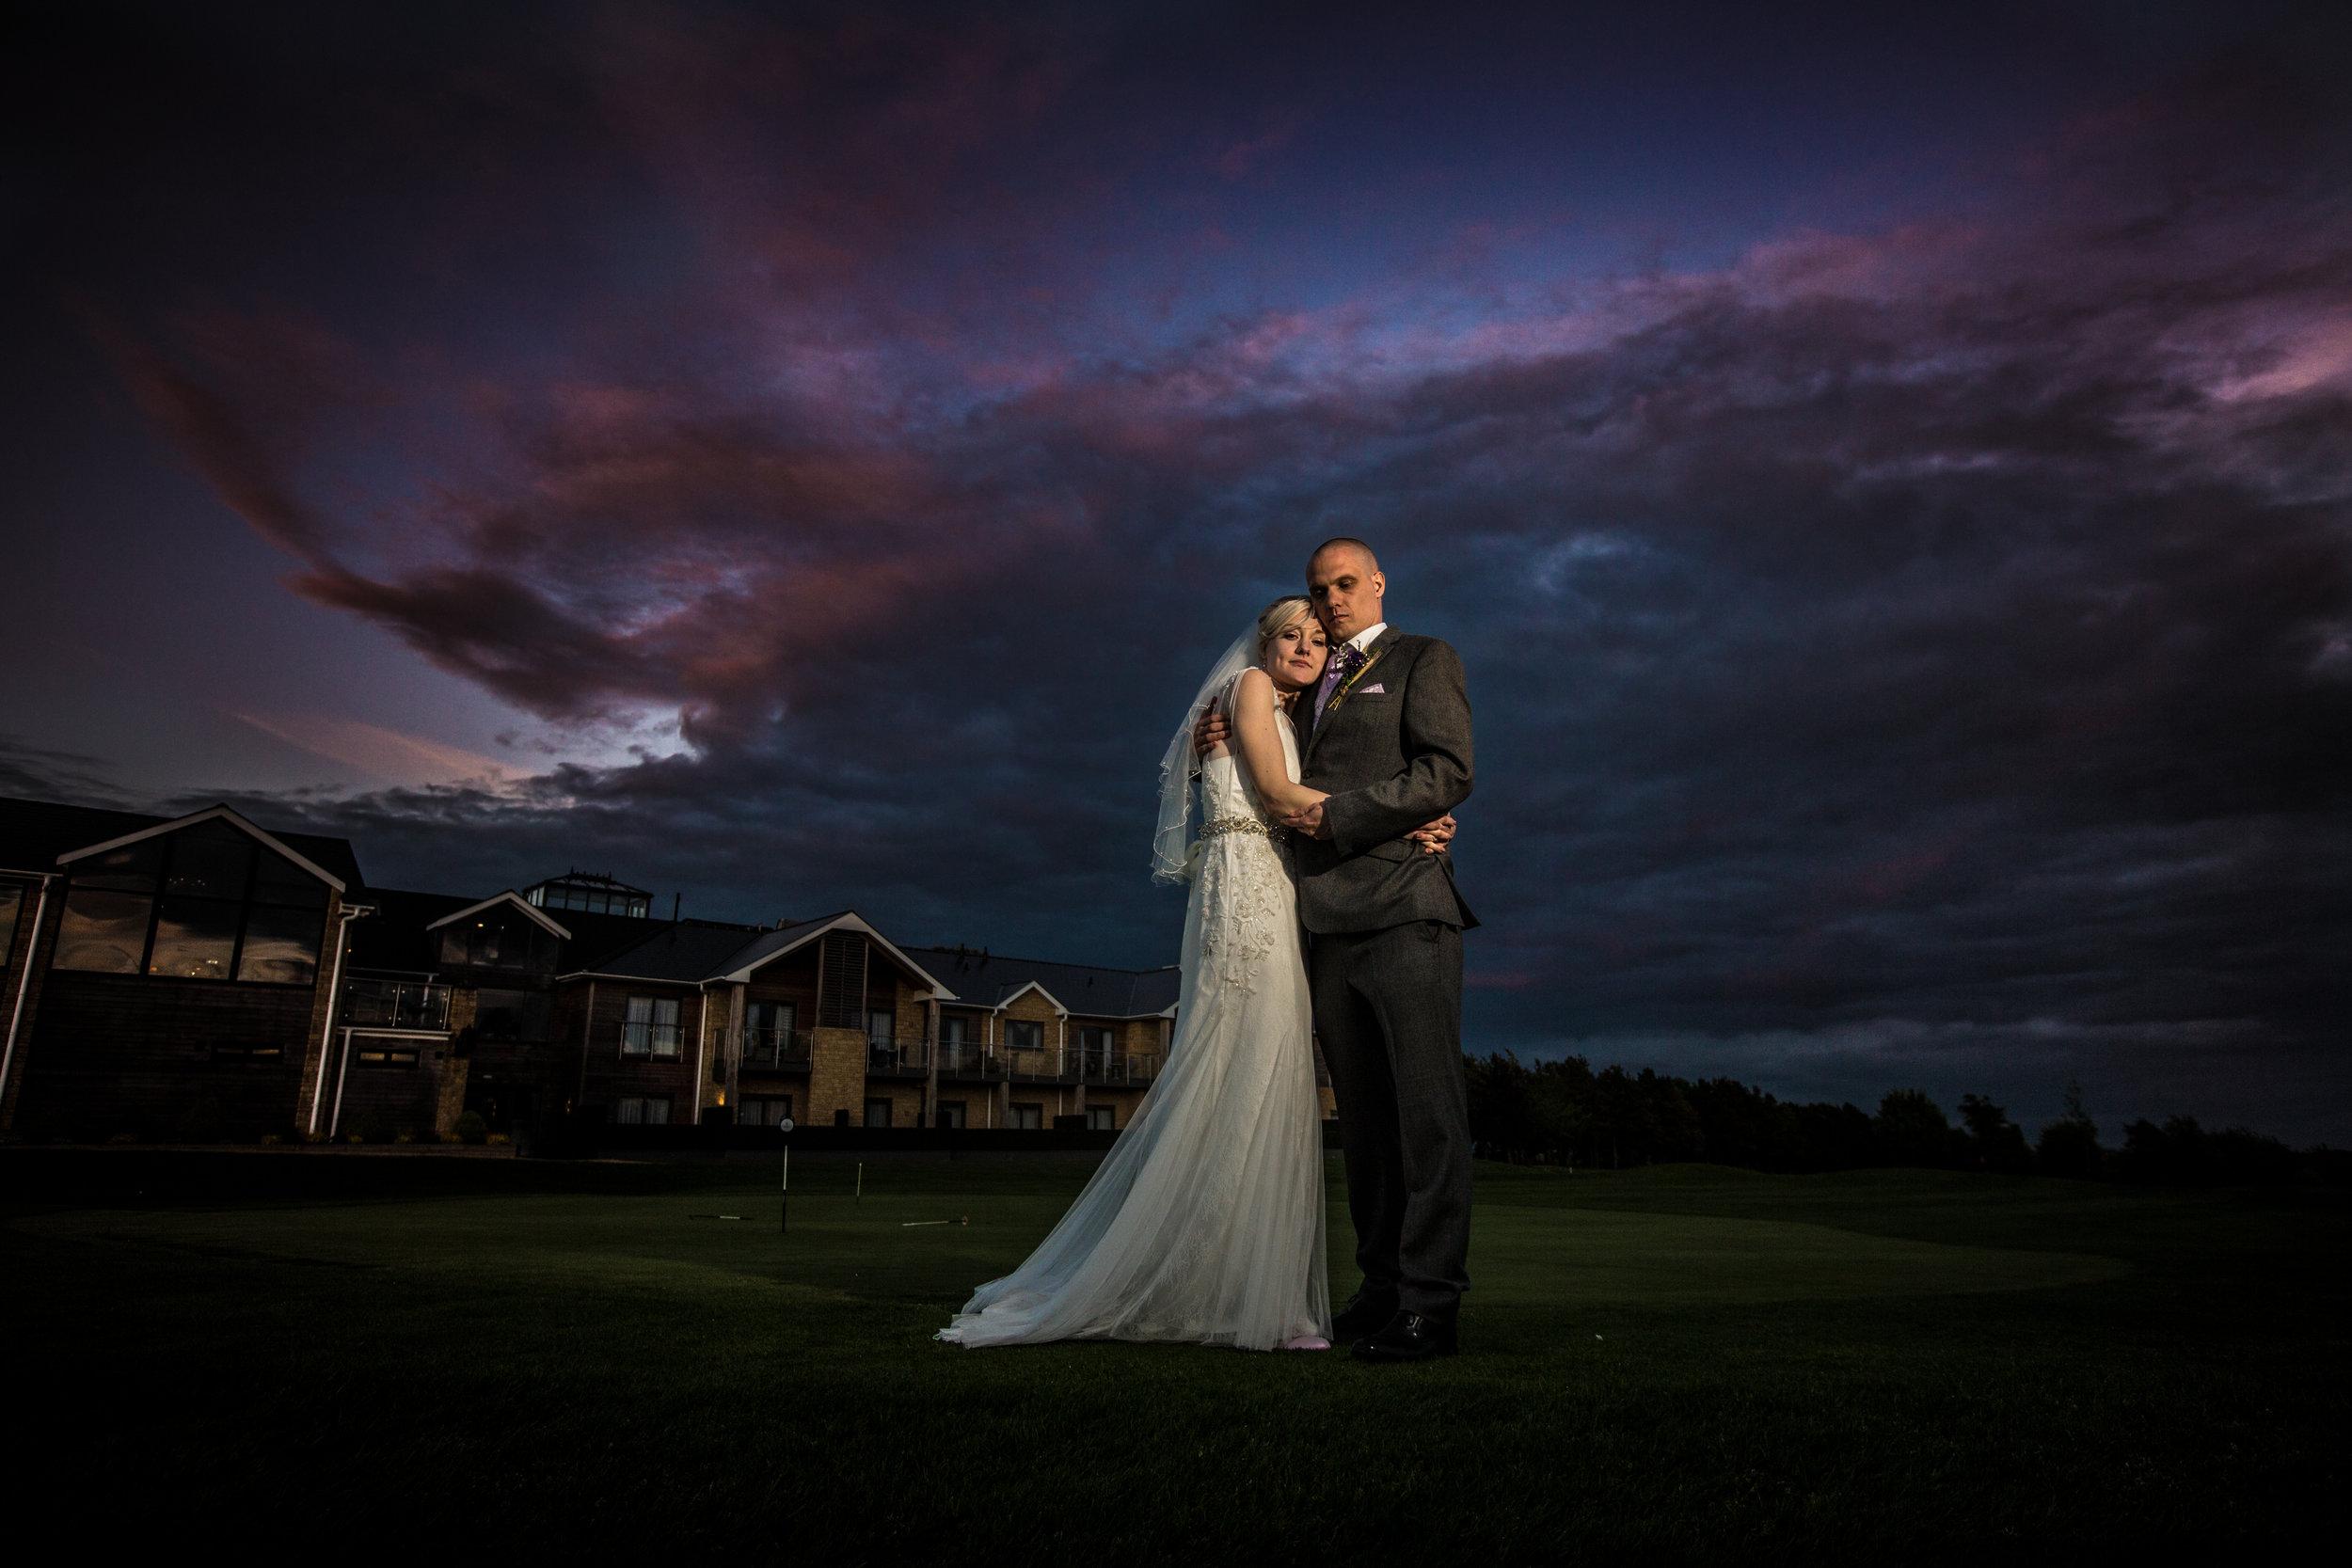 cotswalds-chipping-norton-oxfordshire-london-wedding-photography-bridal-portrait-sunset-45